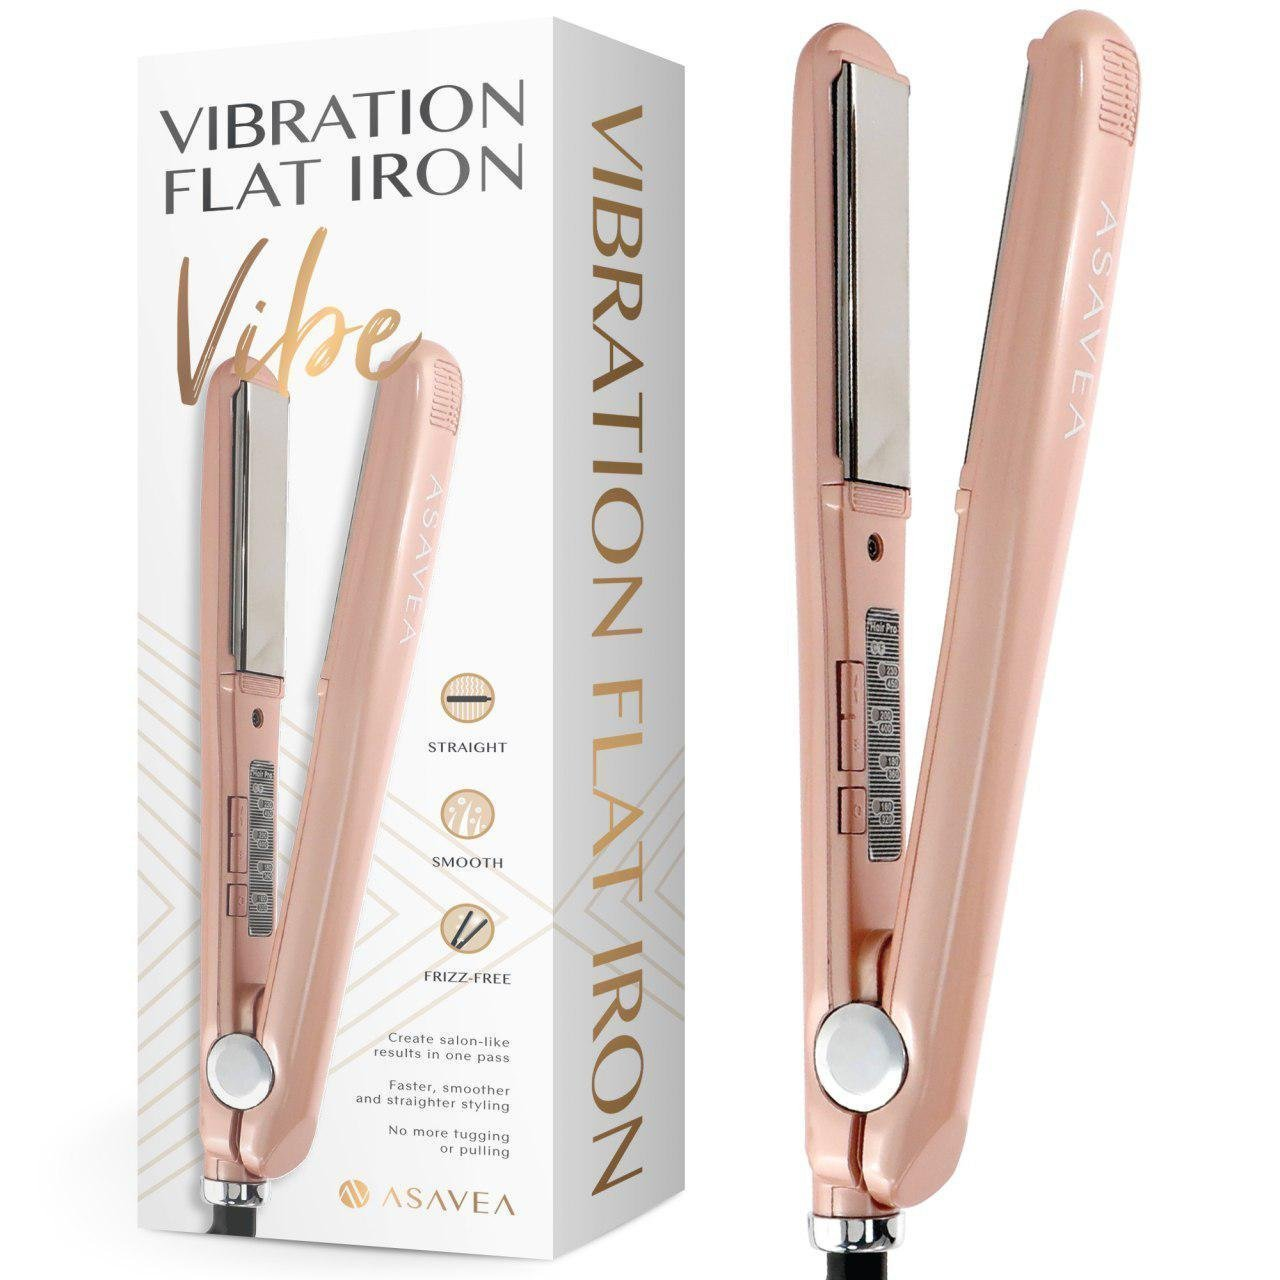 AsaVea Vibration Flat Iron Ceramic Tourmaline Ionic Hair Straightener, Vibration Technology for Salon-Like Results in One Pass